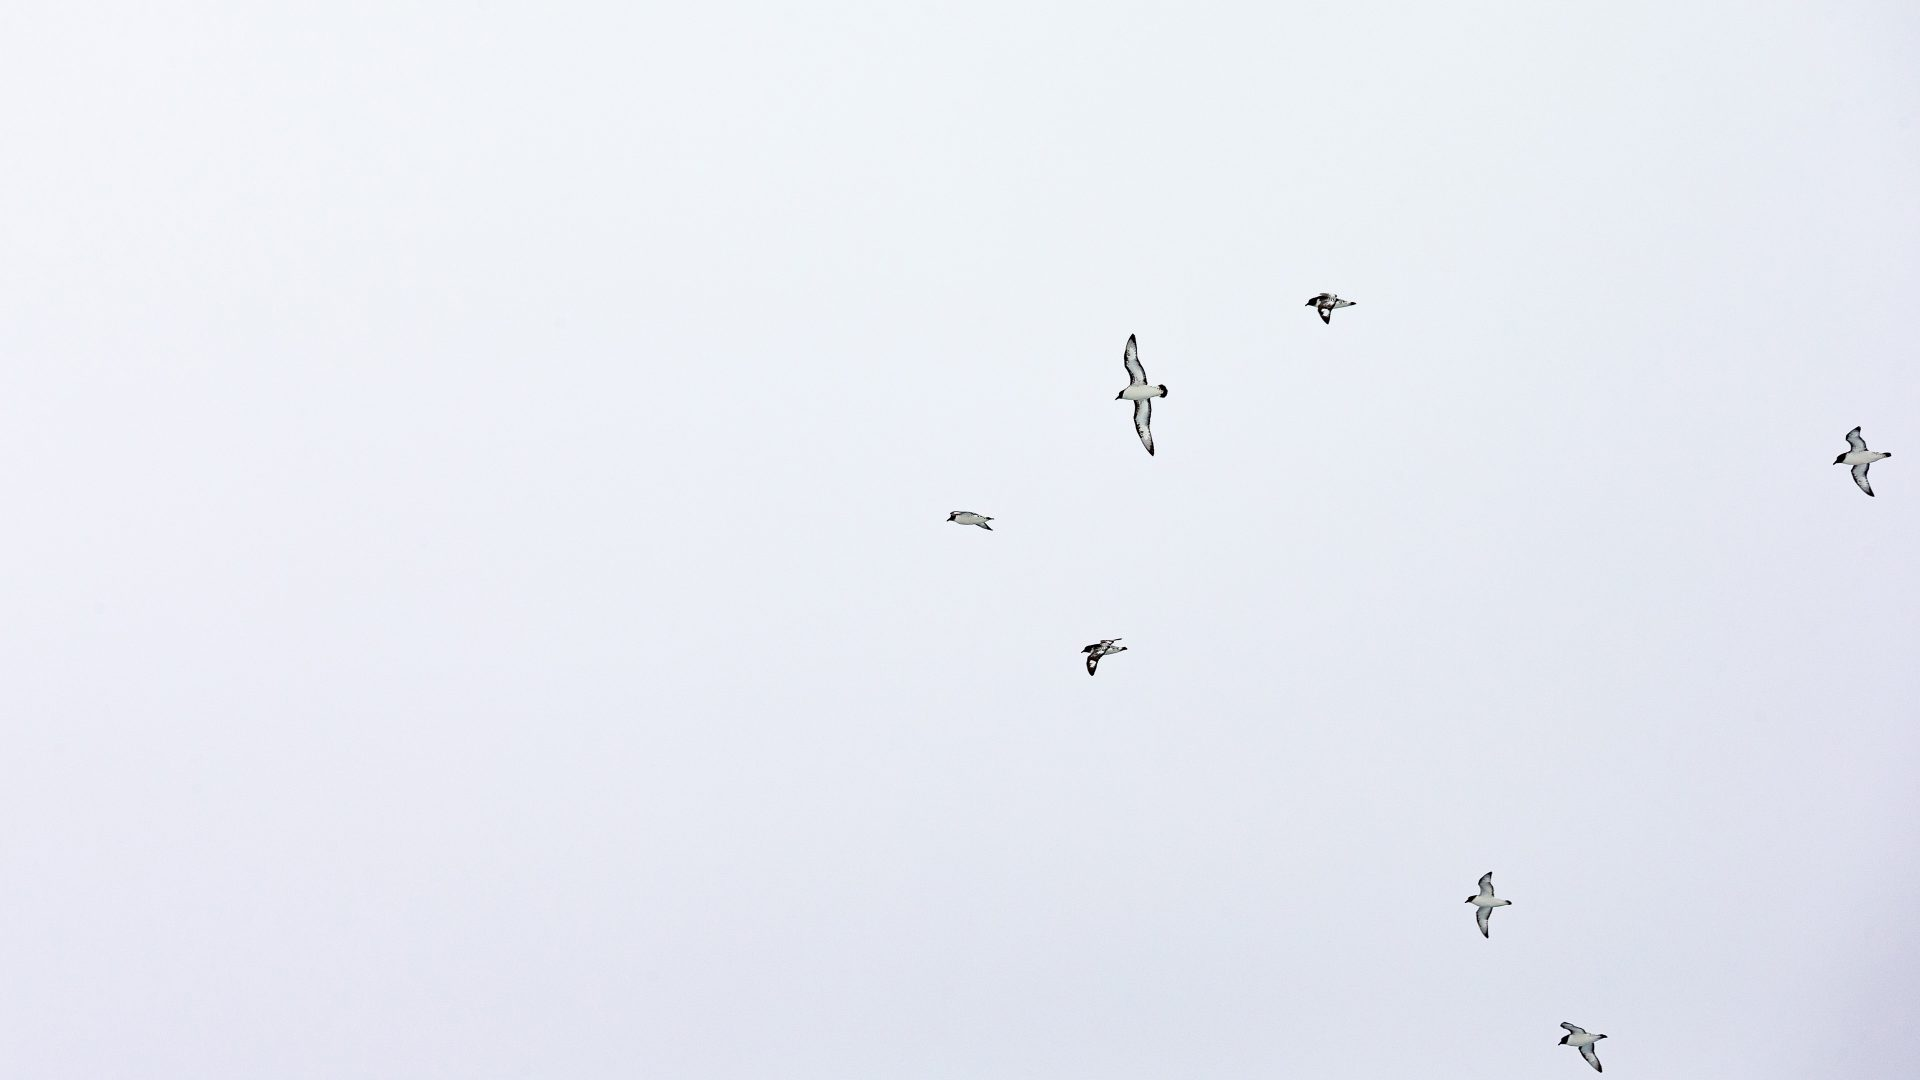 Birds fly against a cloudy sky in Antarctica.